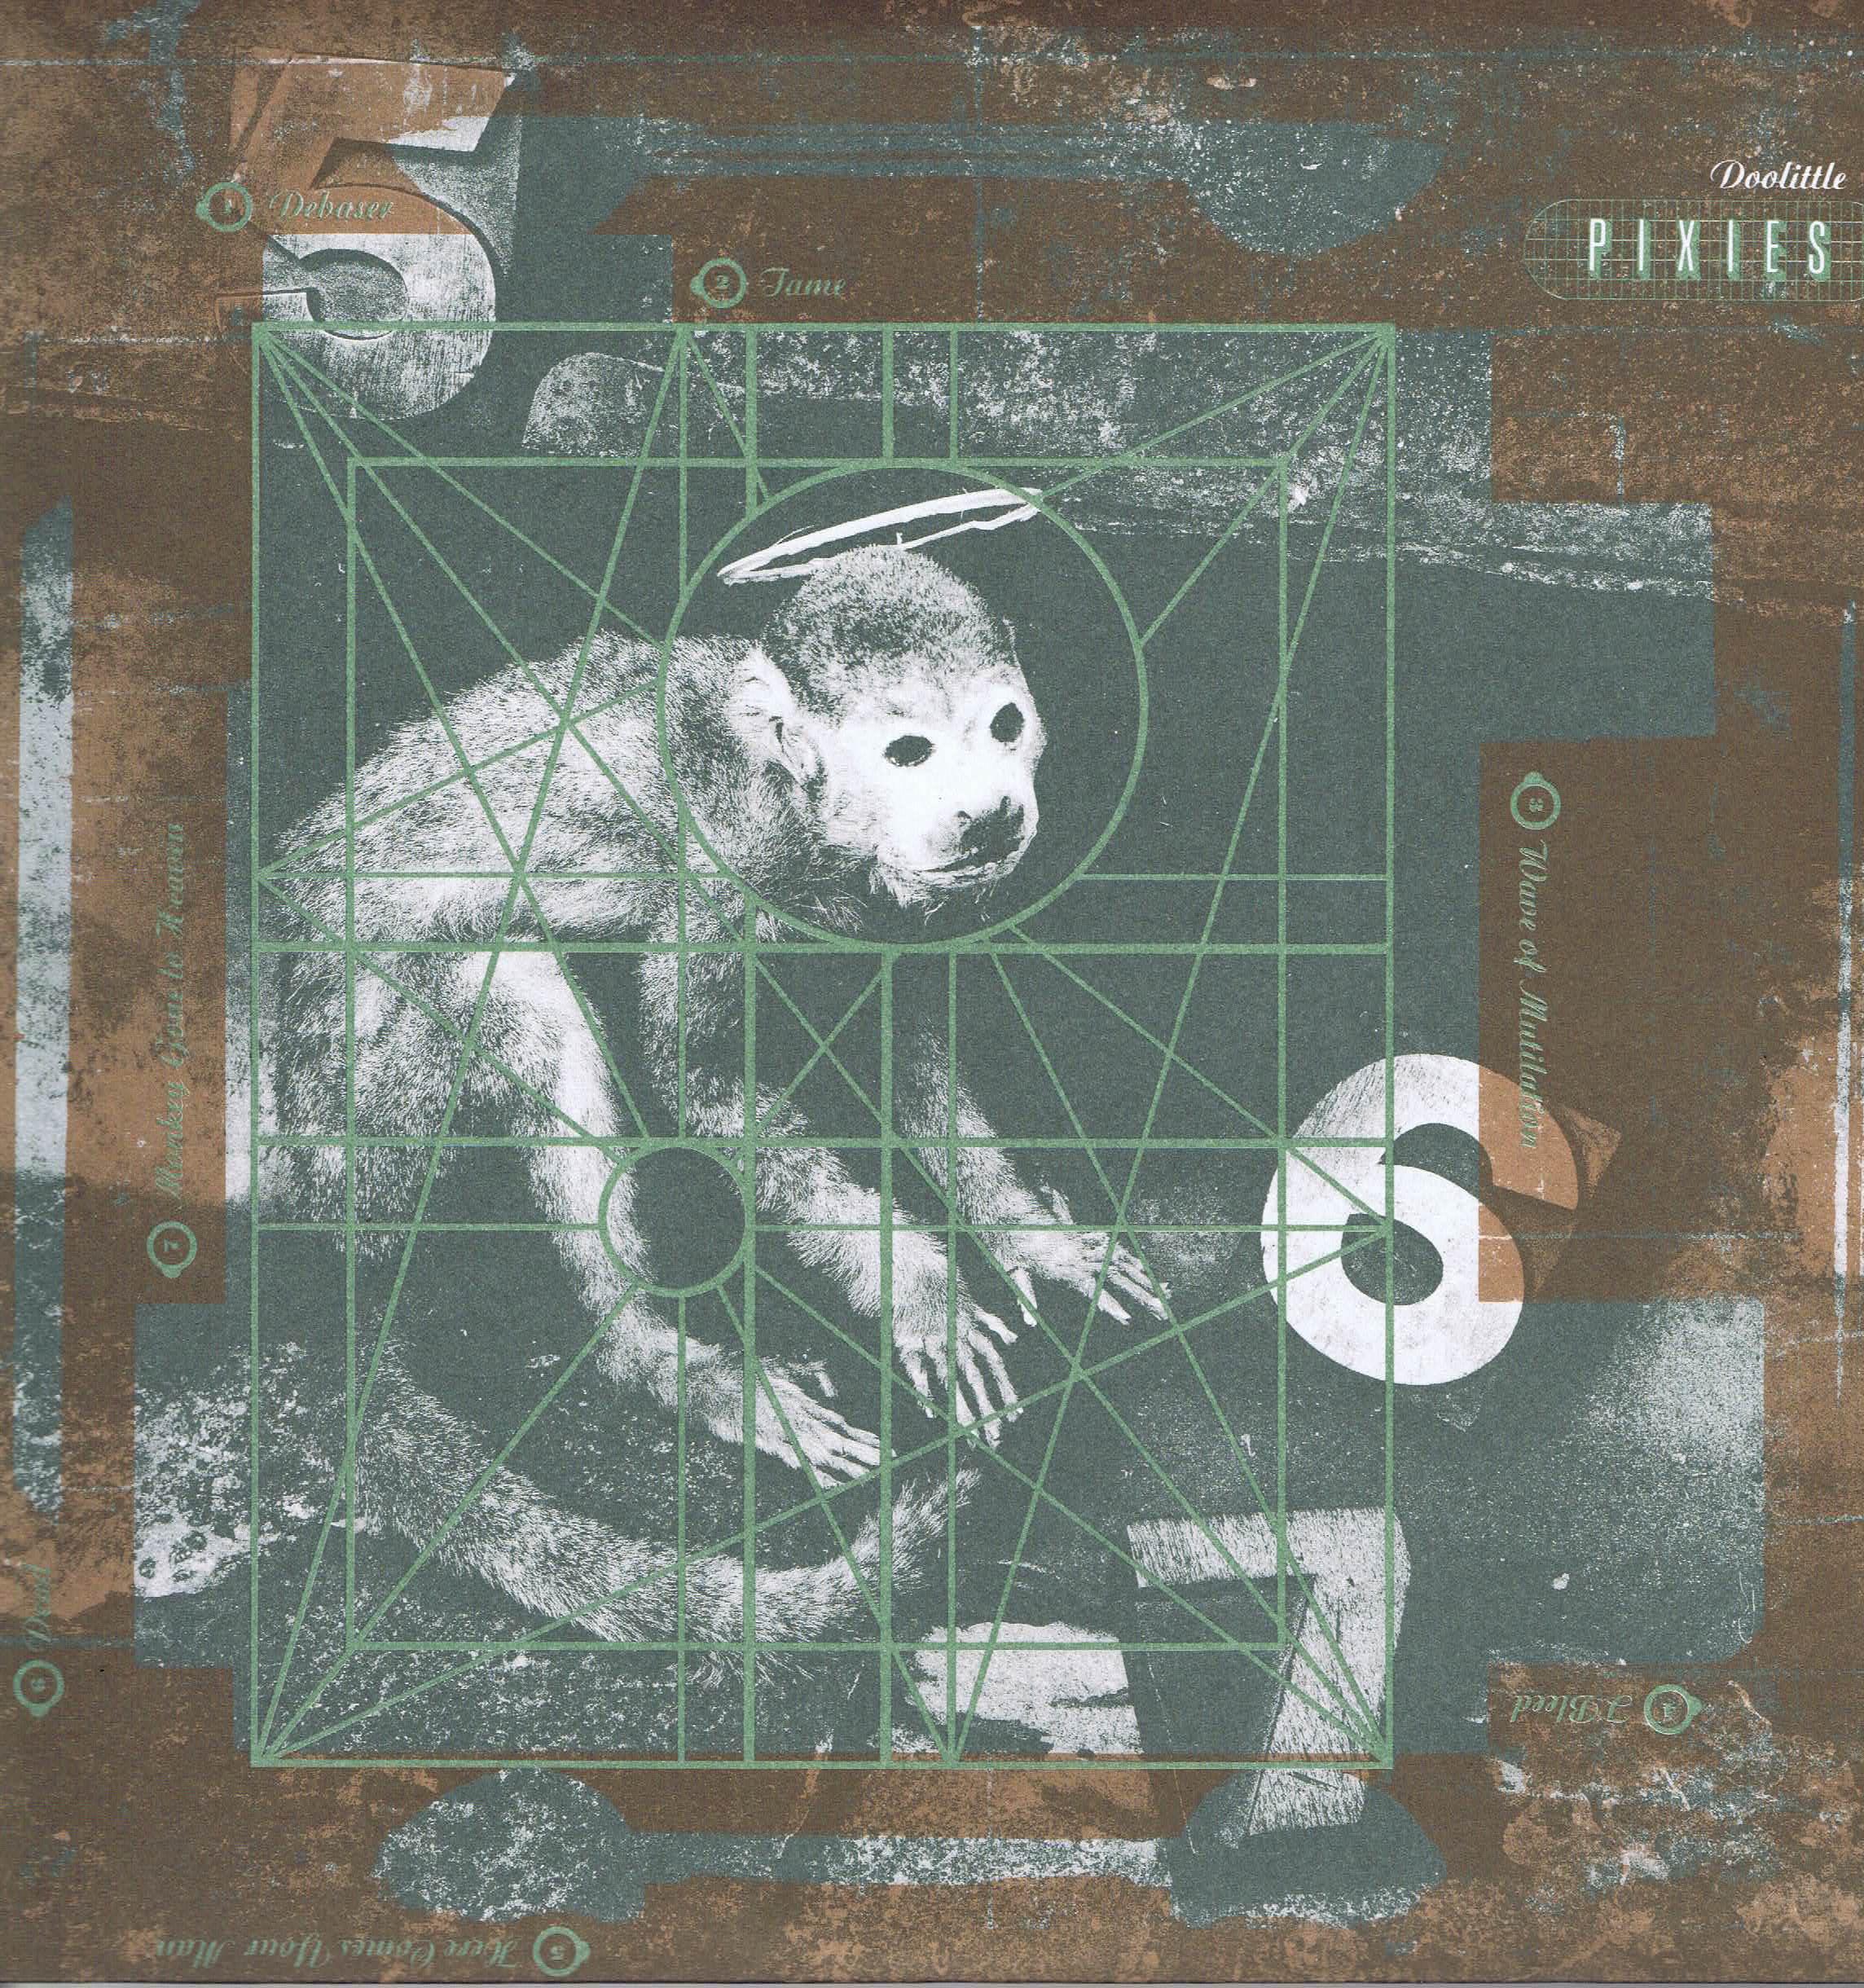 Pixies Doolittle Cad 905 New Amp Sealed Lp Vinyl